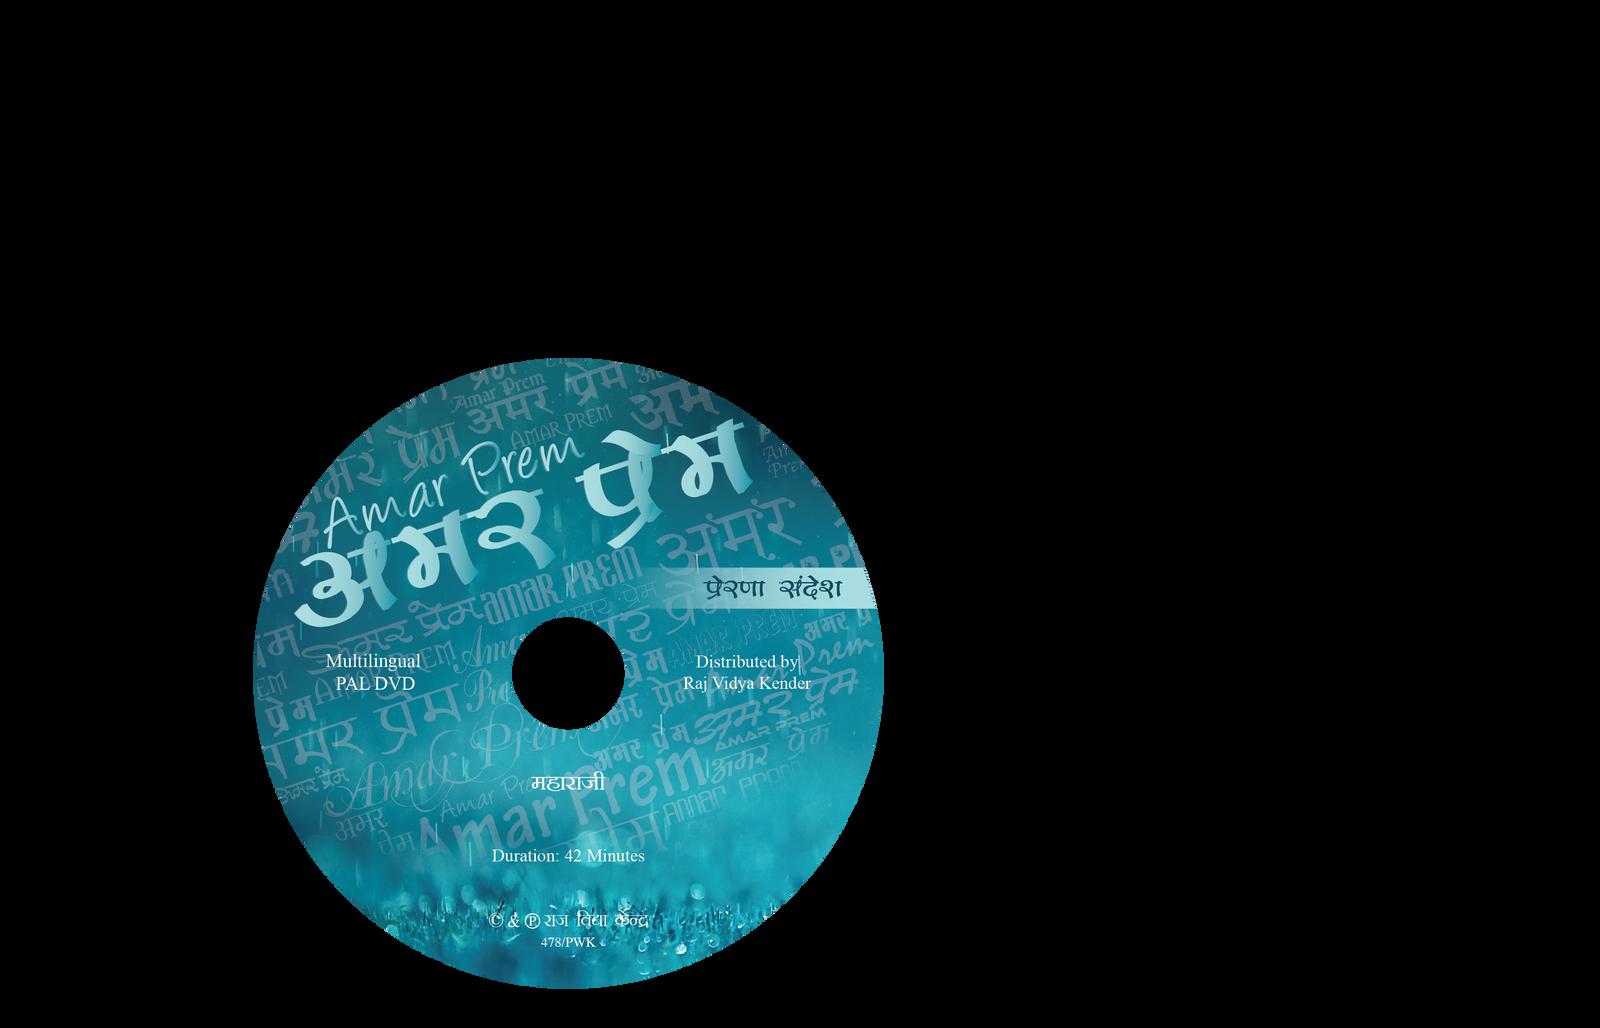 Amar prem immortal love dvd round design by kushagra99 for Prem table 99 00